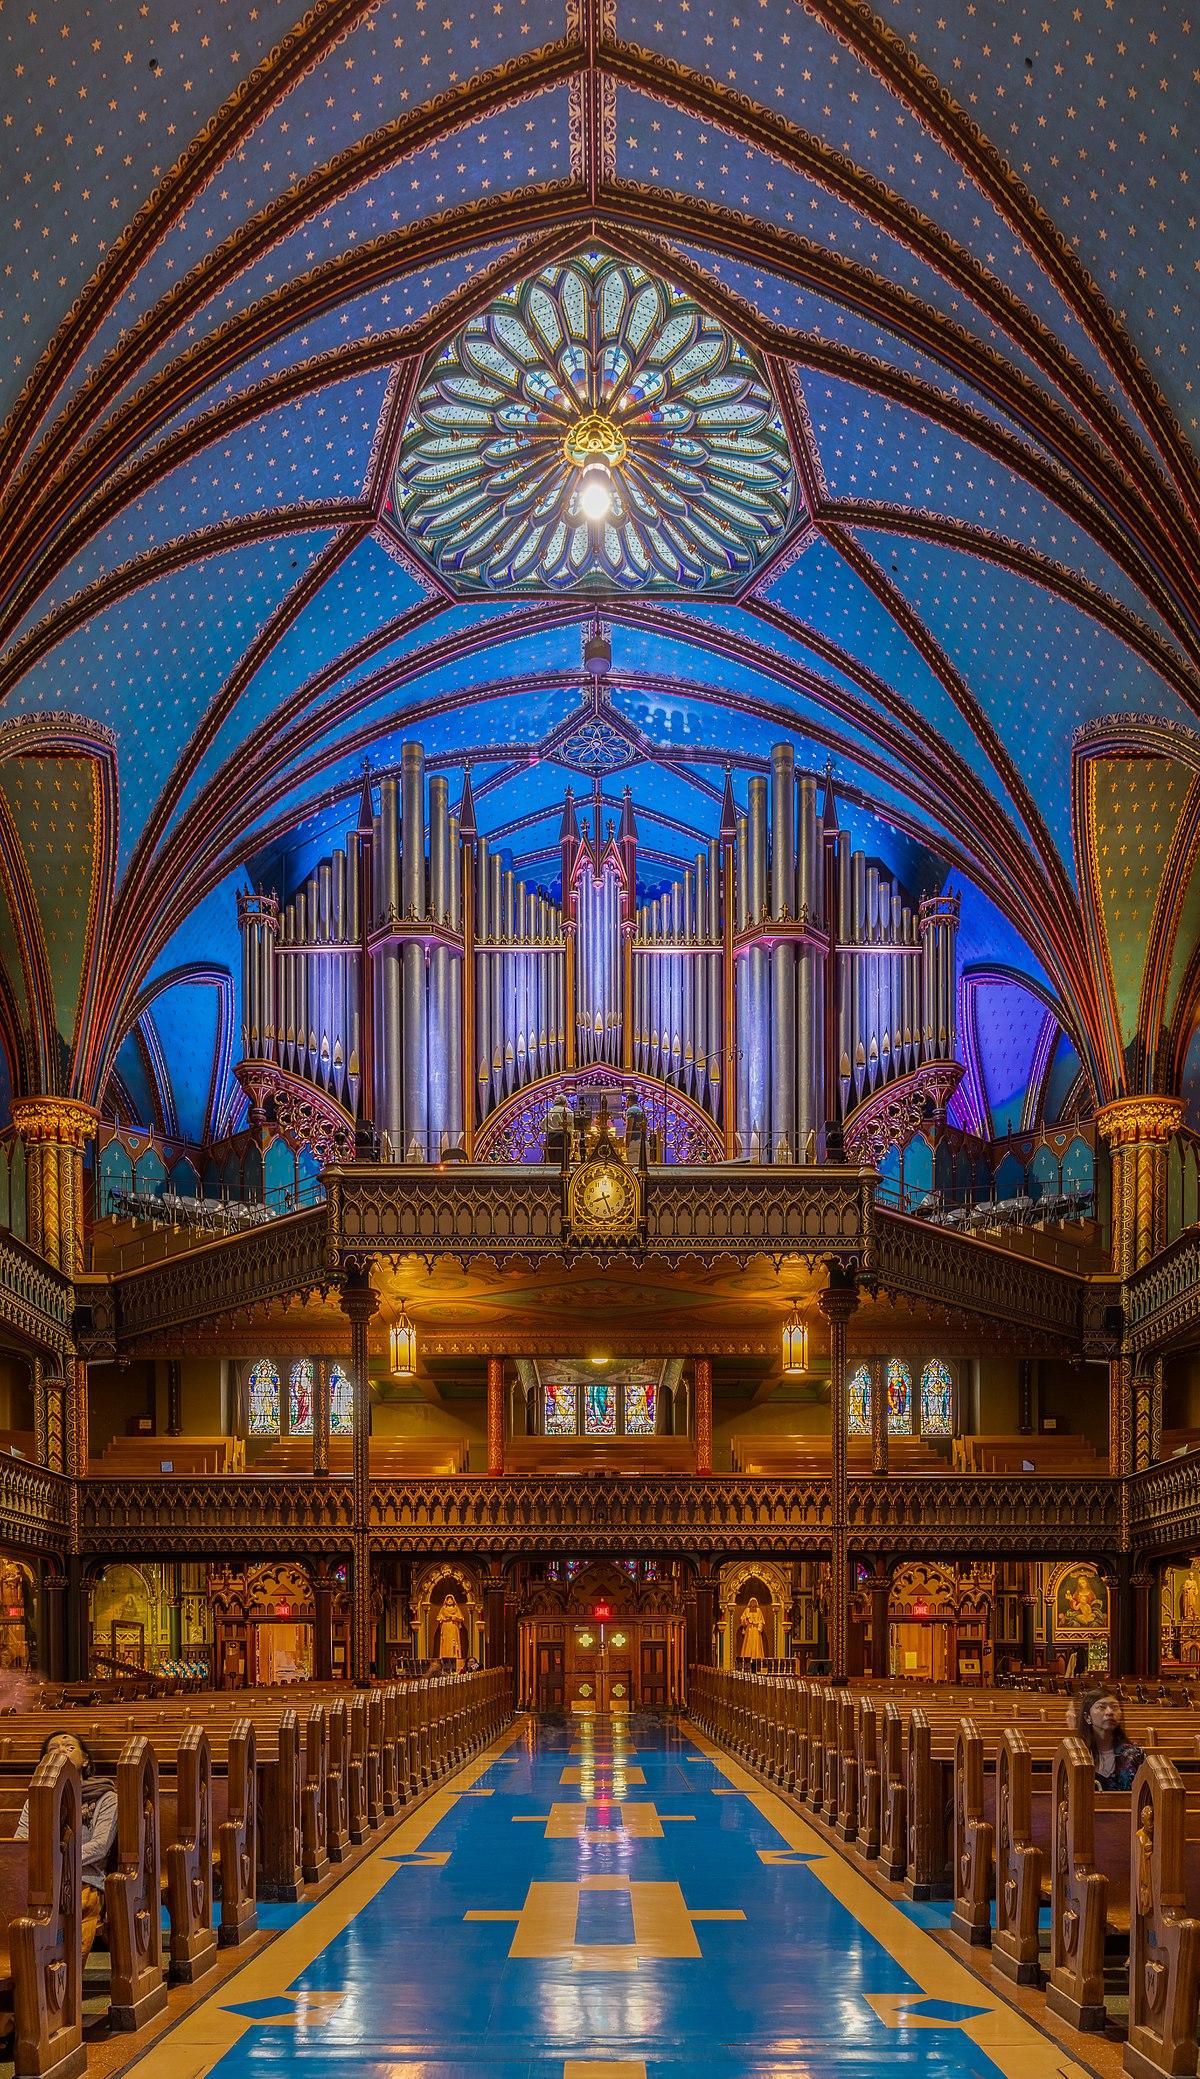 Basílica de Notre-Dame, Montreal, Canadá, 2017-08-12, DD 31-33 HDR.jpg